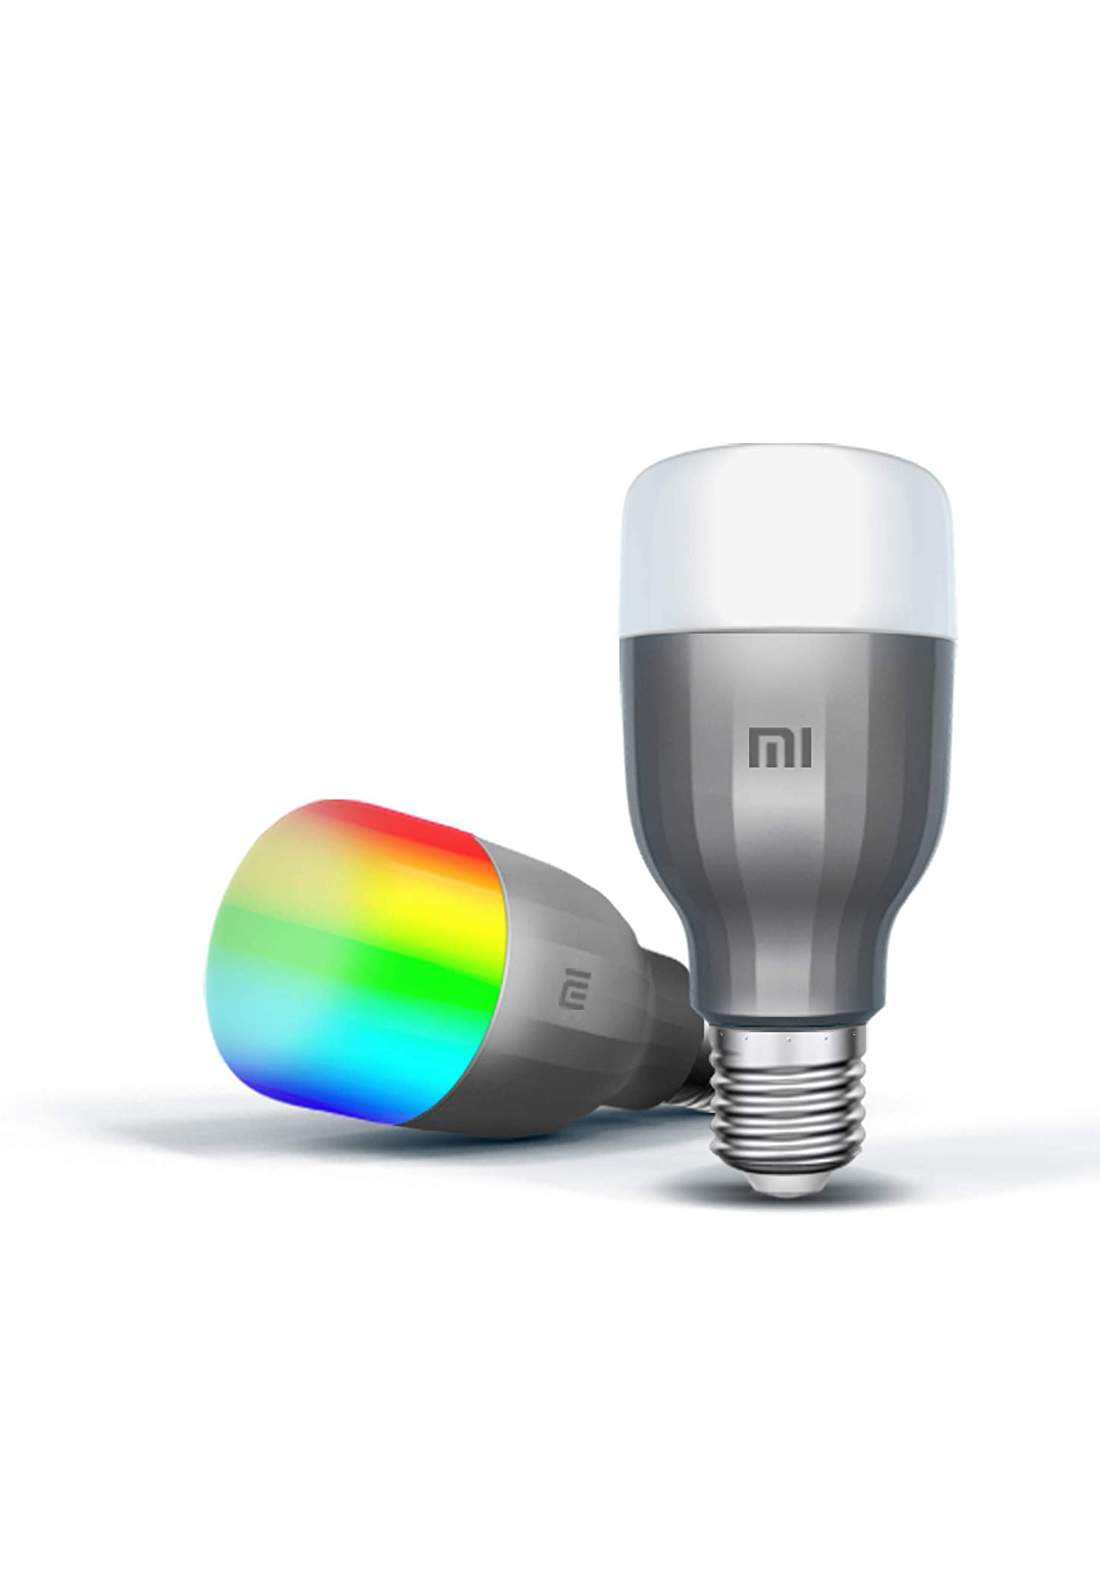 Xiaomi Mi LED Smart Bulb Essential White and Color  لمبة ذكيه led ابيض وملون